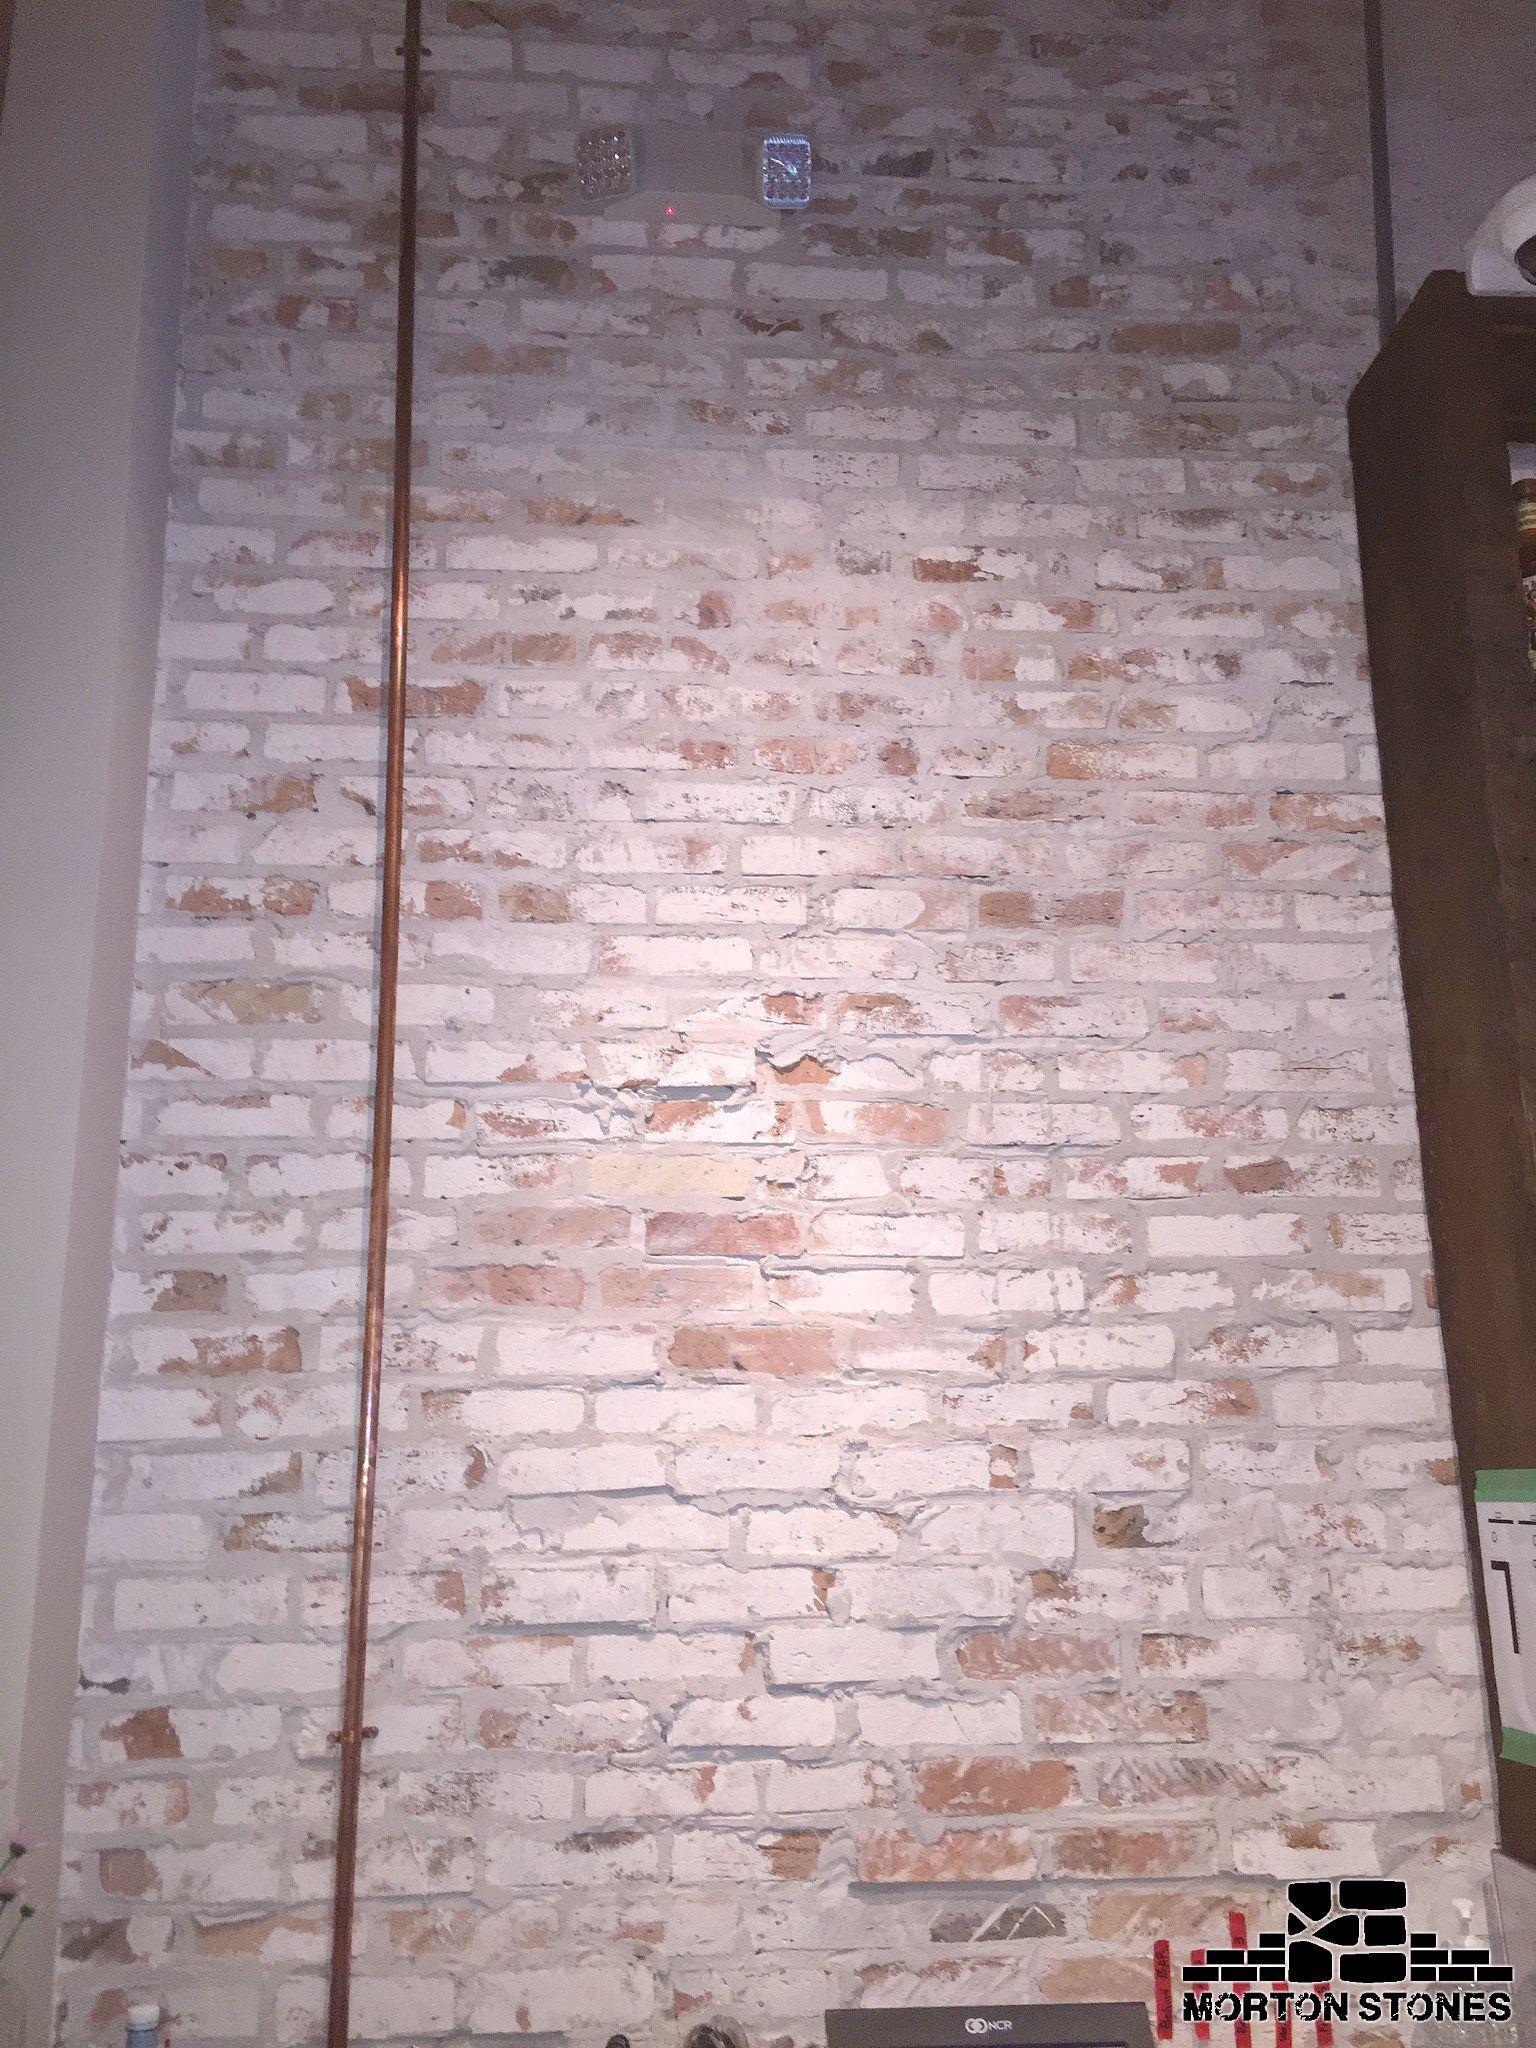 This An Example Of A Perfect Whitewashed Brick Veneer Wall Mortonstones Brick Brickwall Rustic Decor Br Brick Veneer Wall White Wash Brick Brick Veneer